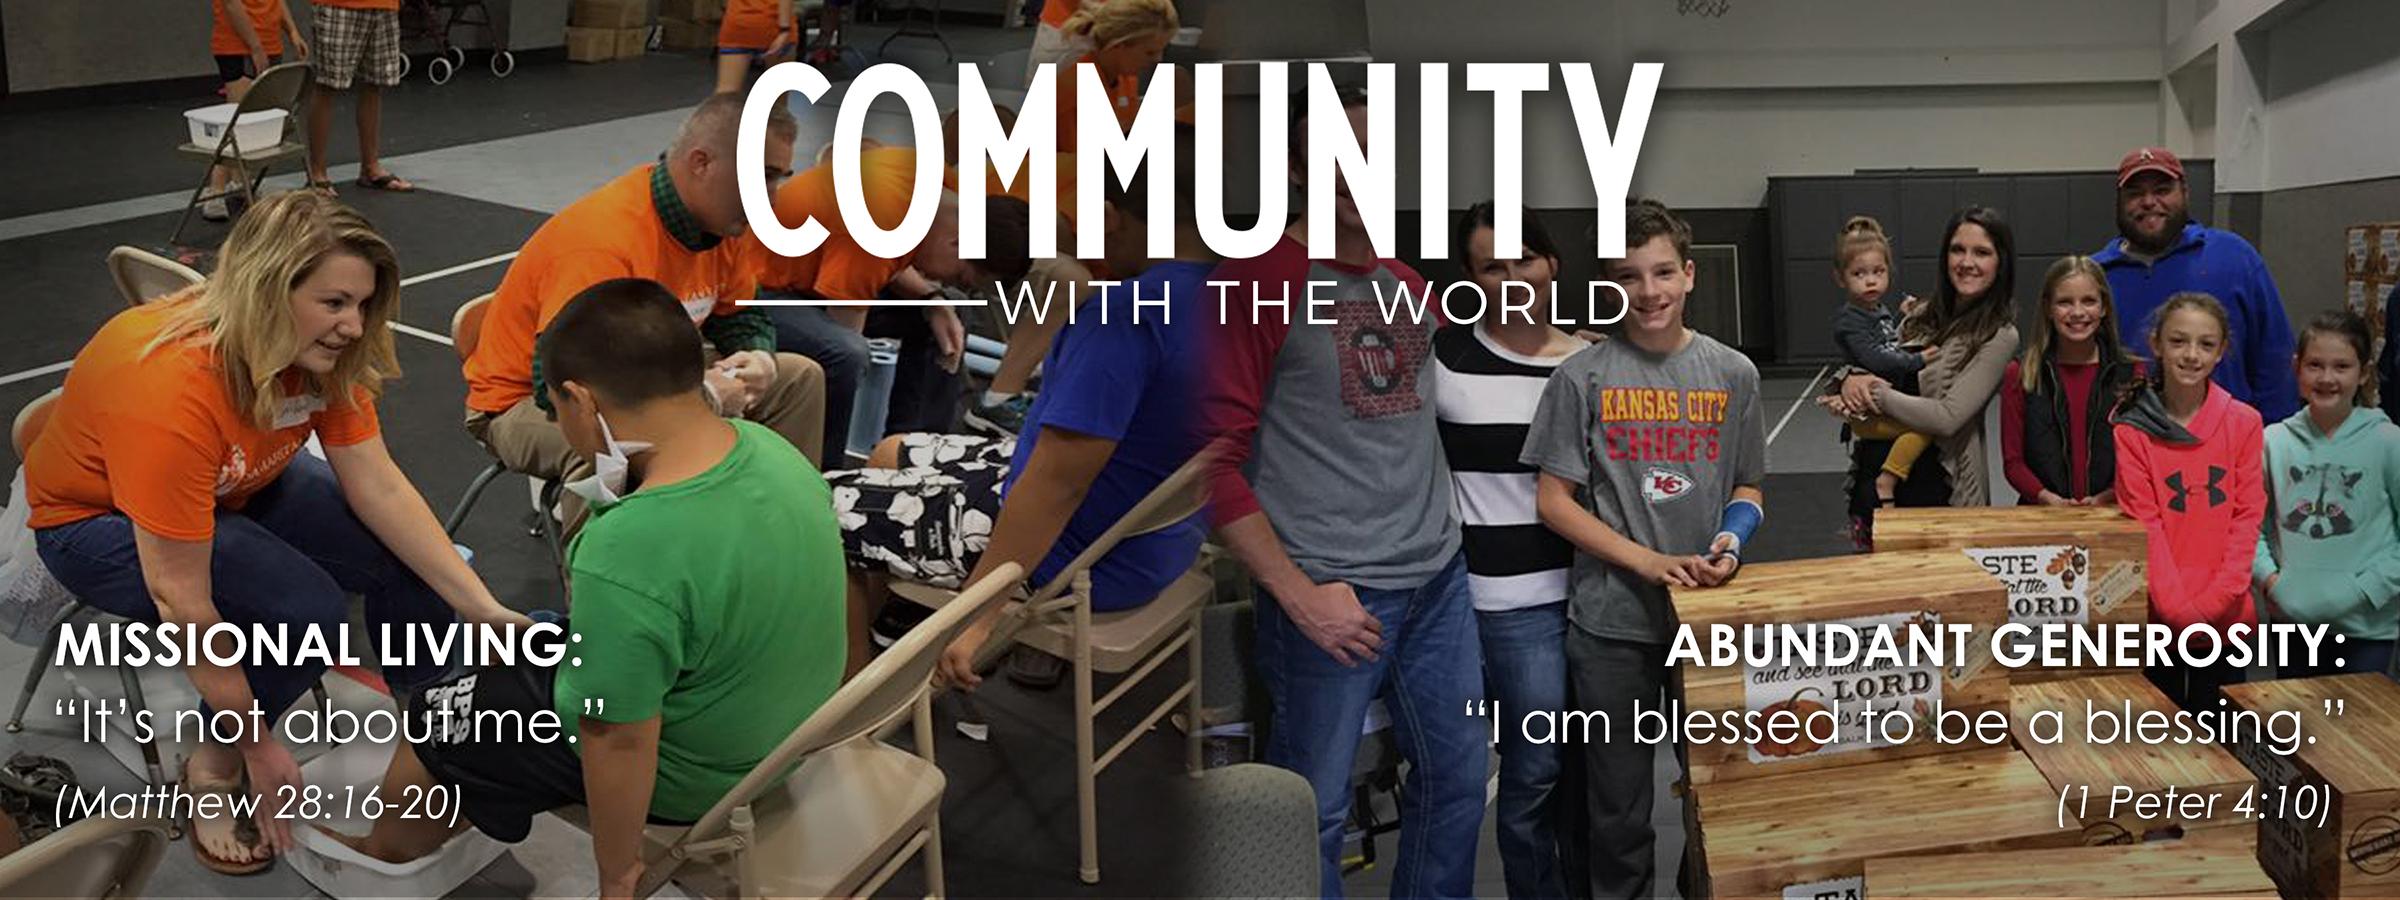 Community wWORLD 2wide.jpg